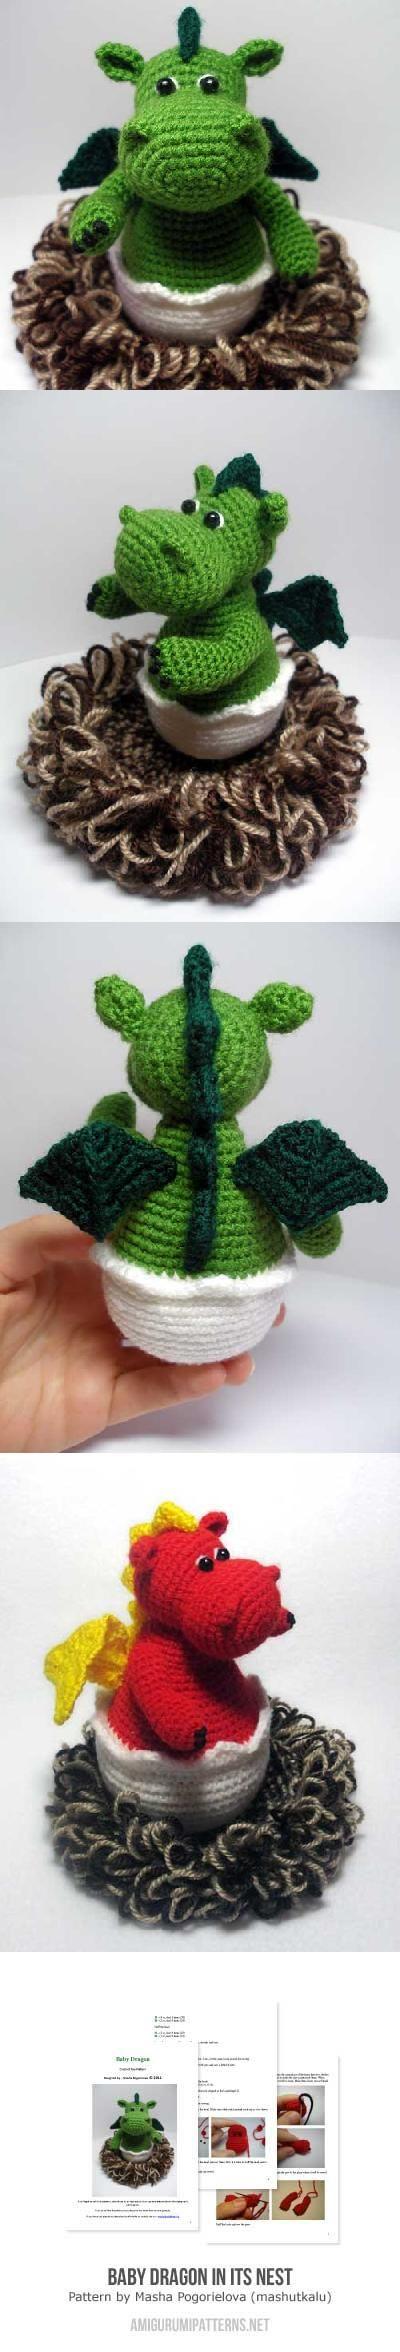 Baby Dragon In Its Nest Amigurumi Pattern